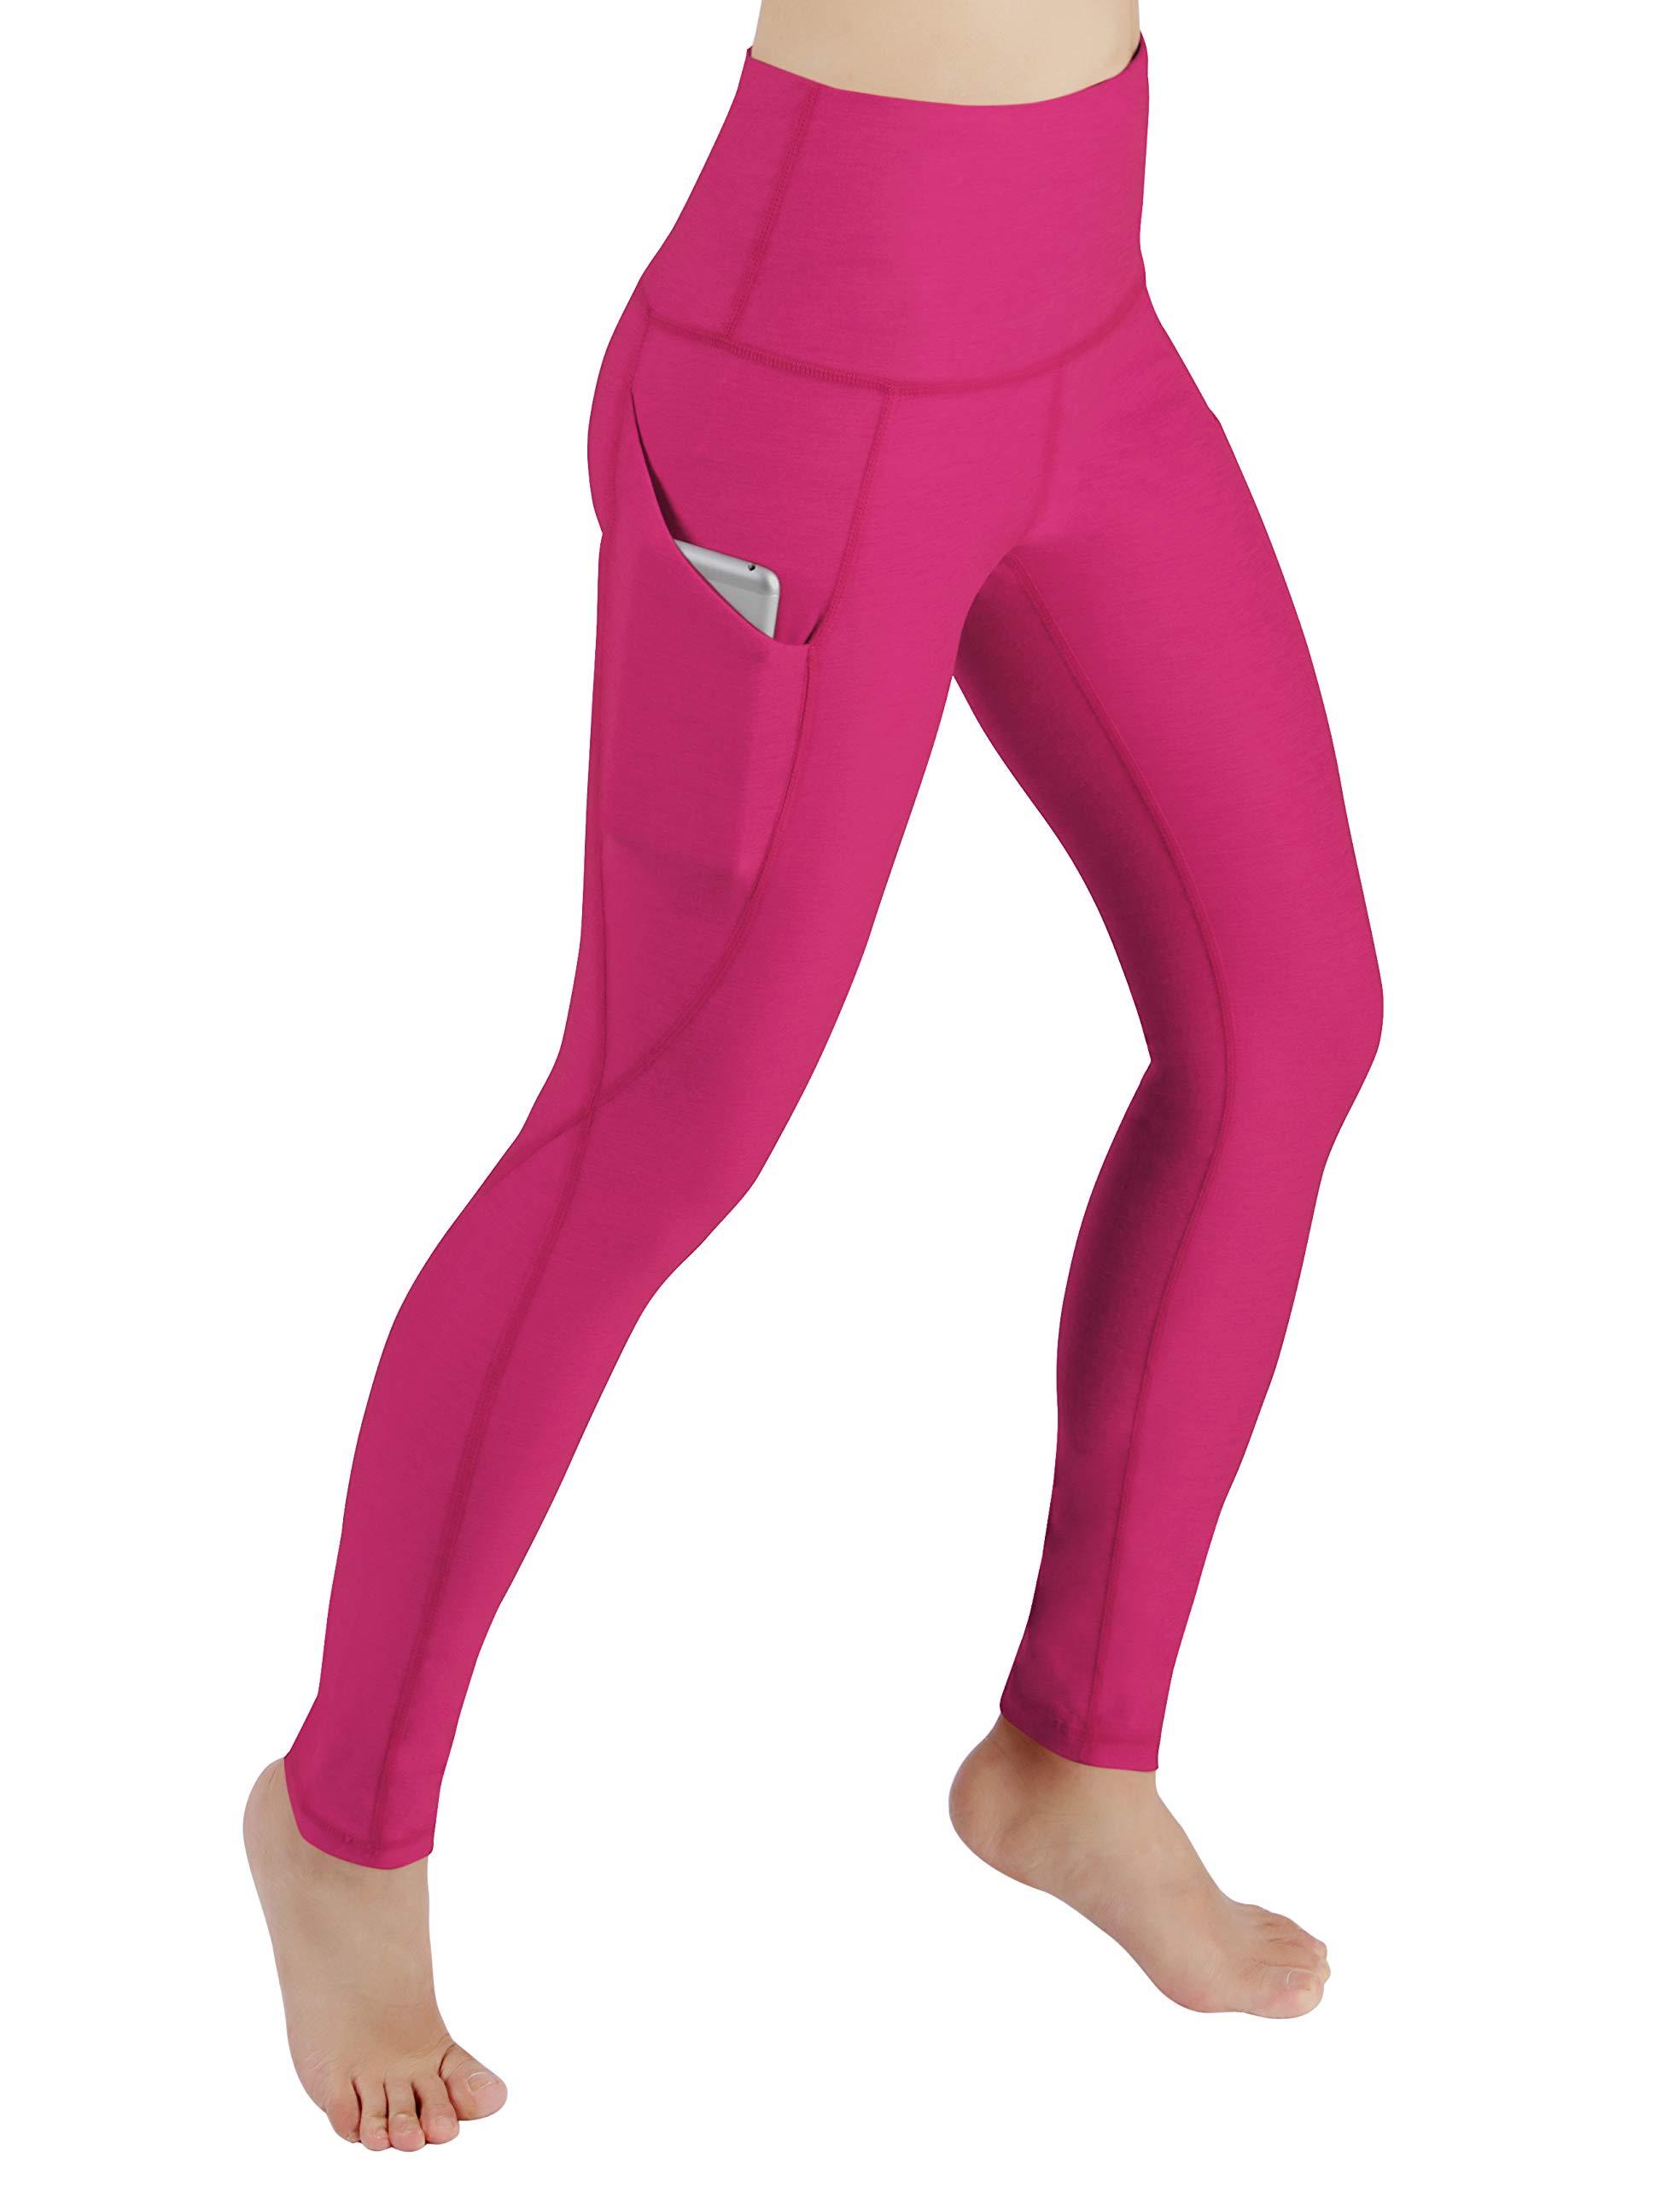 ODODOS Women's High Waist Yoga Pants with Pockets,Tummy Control,Workout Pants Running 4 Way Stretch Yoga Leggings with Pockets,Fuchsia,Medium by ODODOS